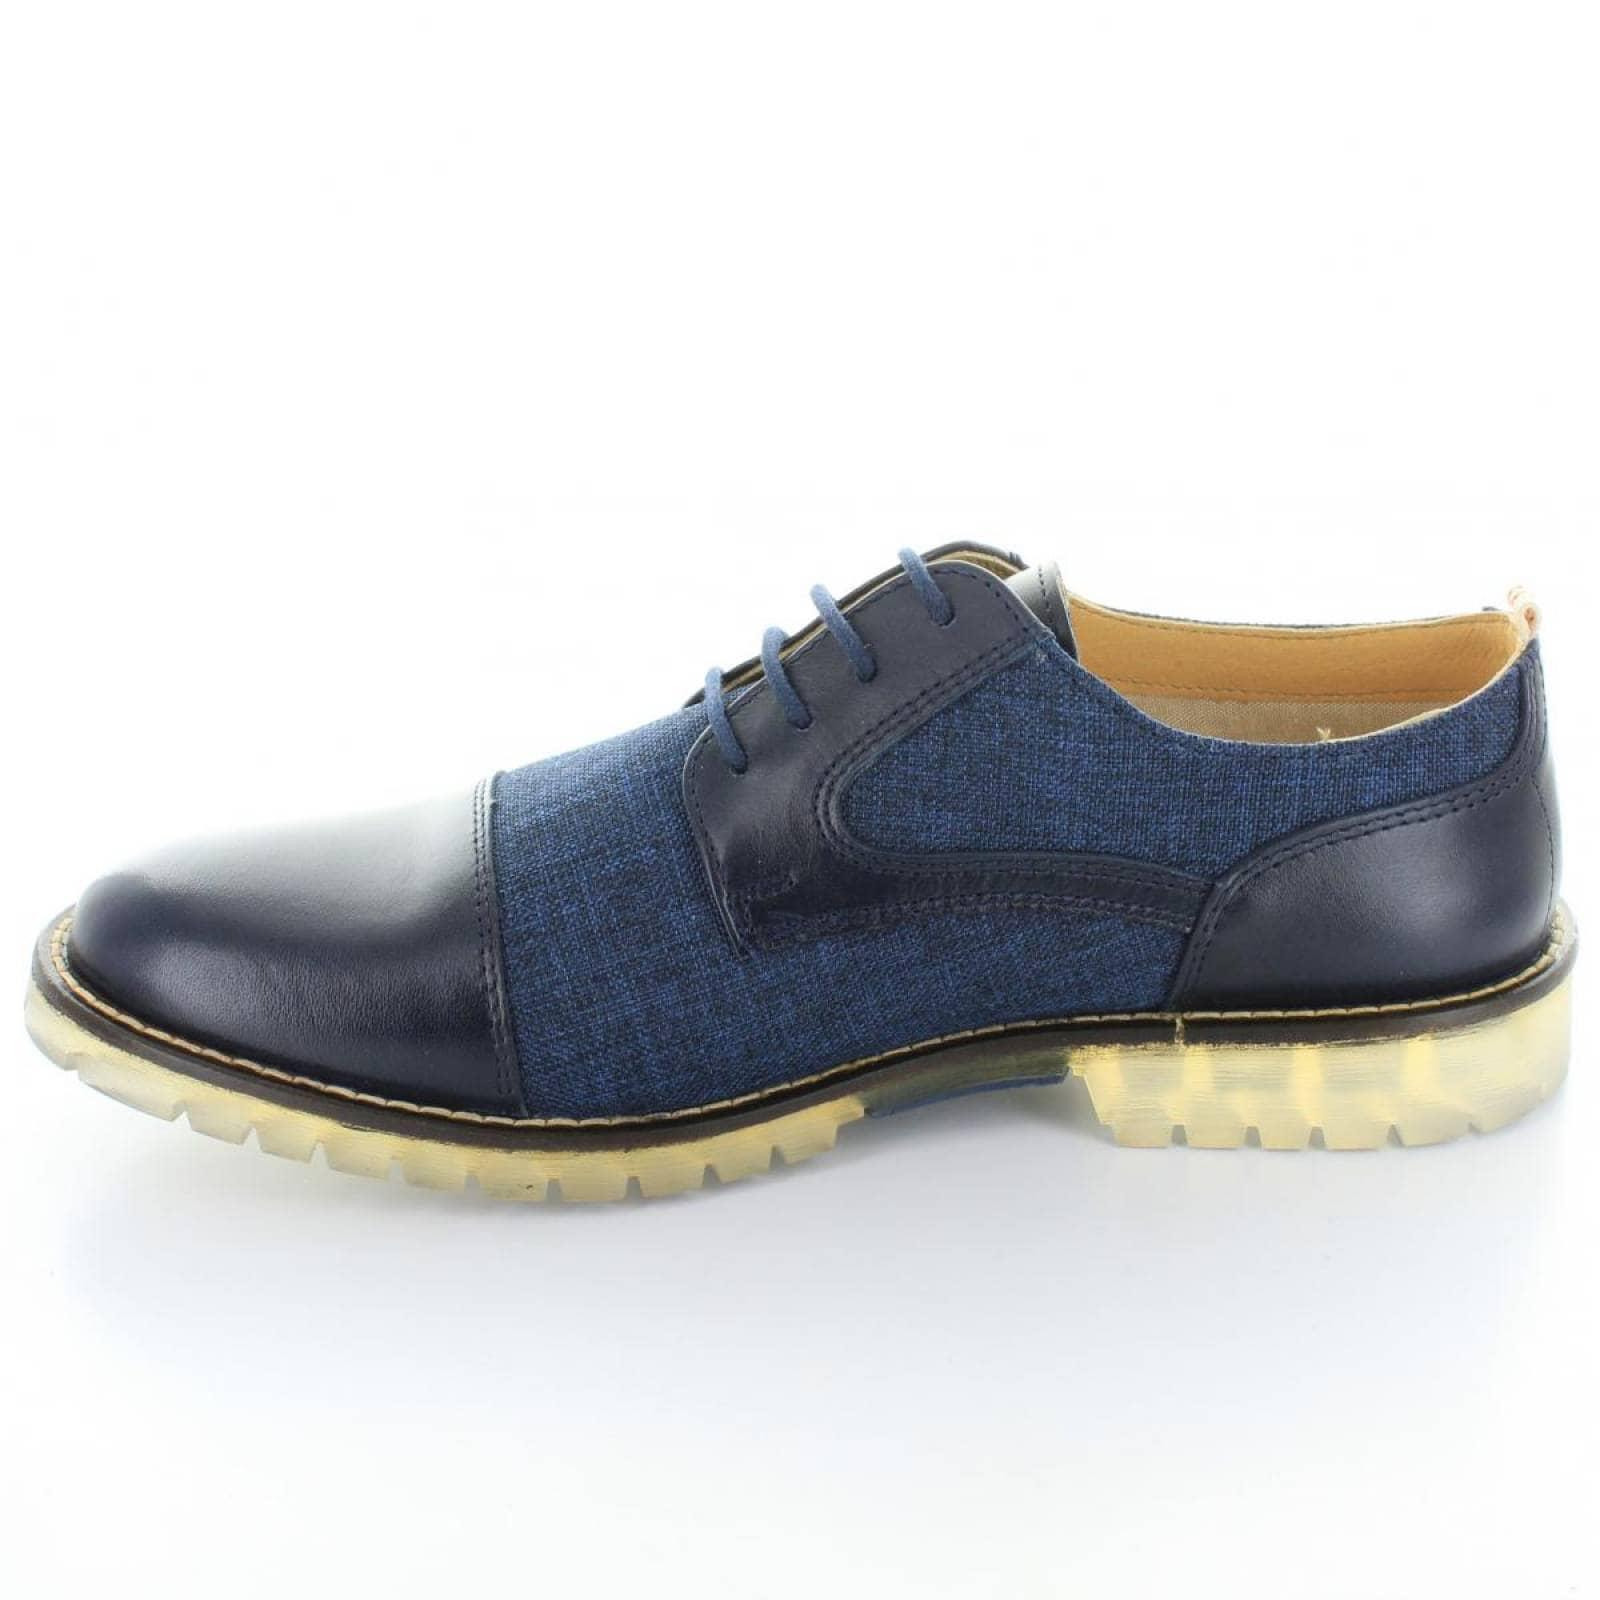 7796b0cf00 Zapato para hombre brantano 701 045149 color marino